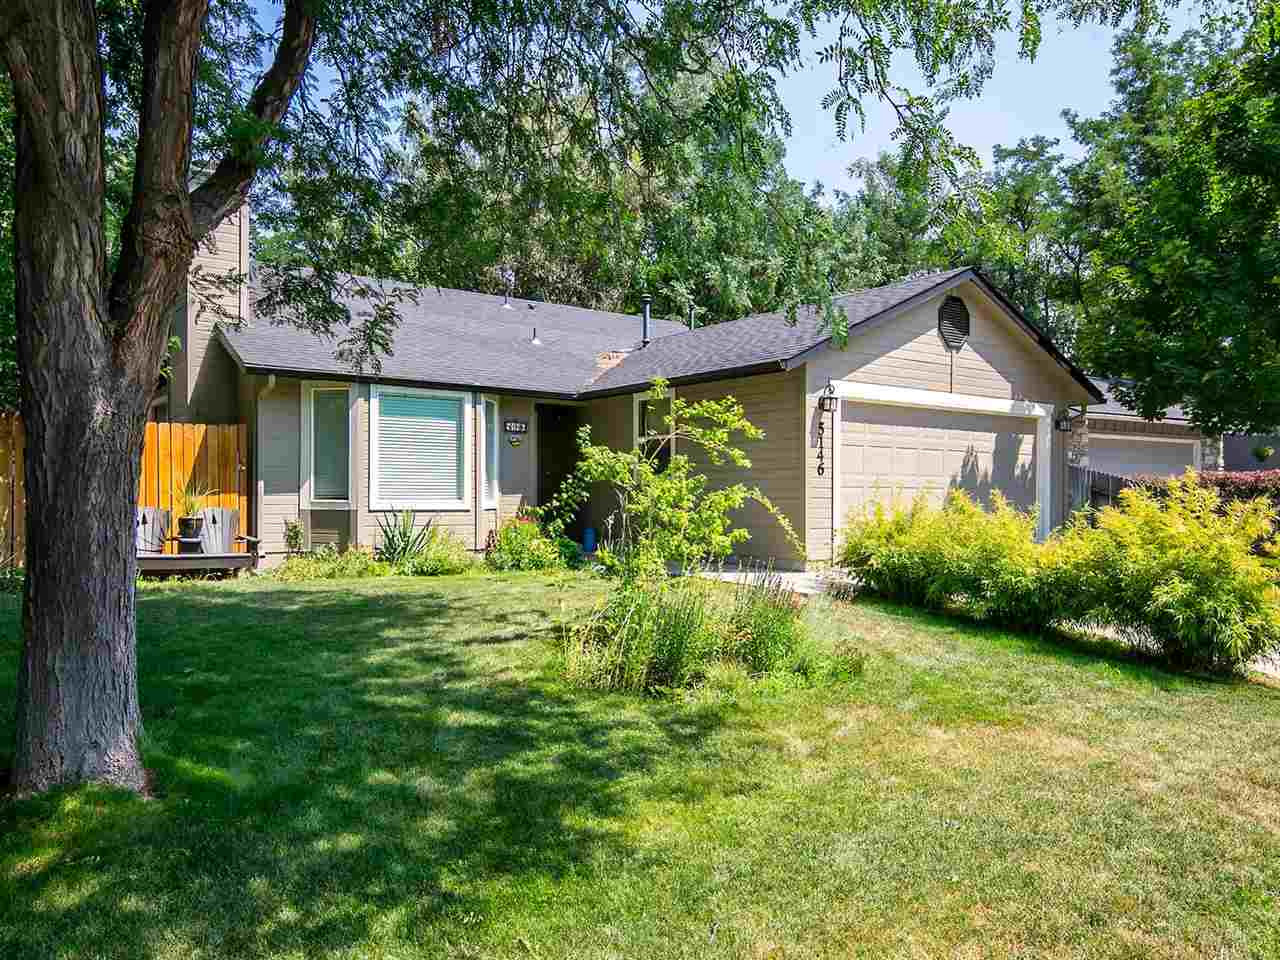 5146 N Turret Way, Boise, ID 83703